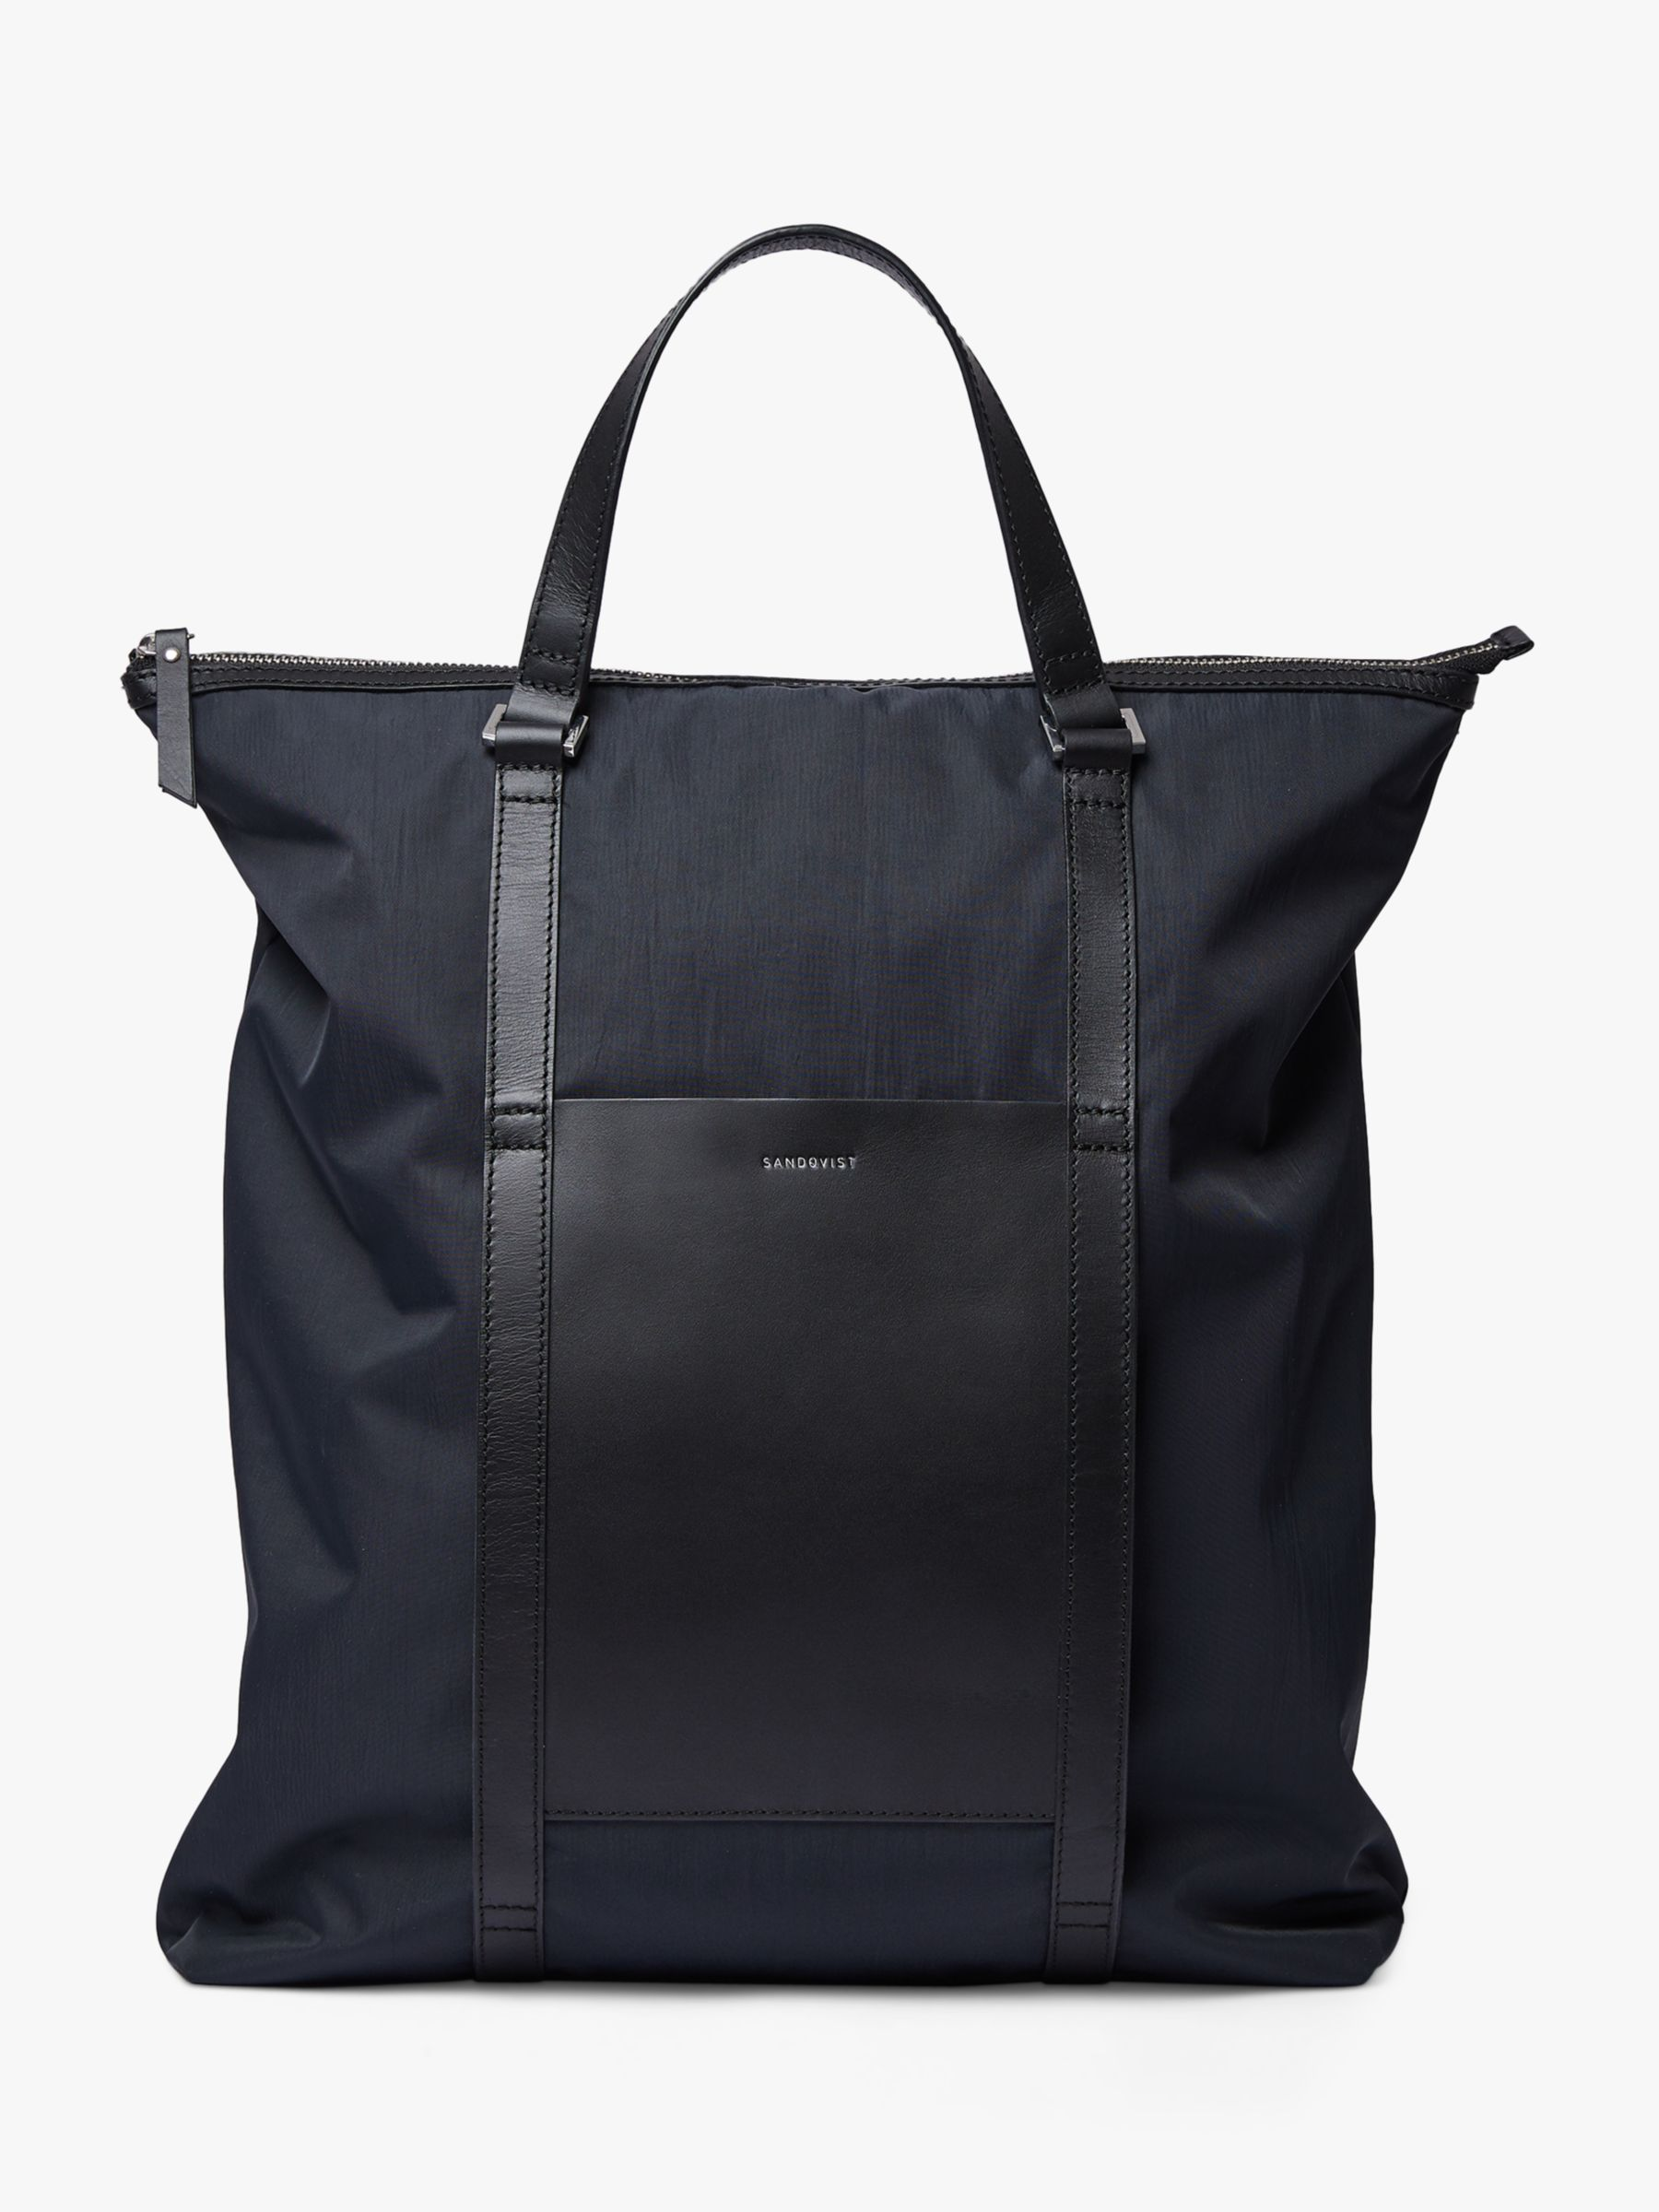 Sandqvist Sandqvist Marta Recycled Nylon Tote Backpack, Black